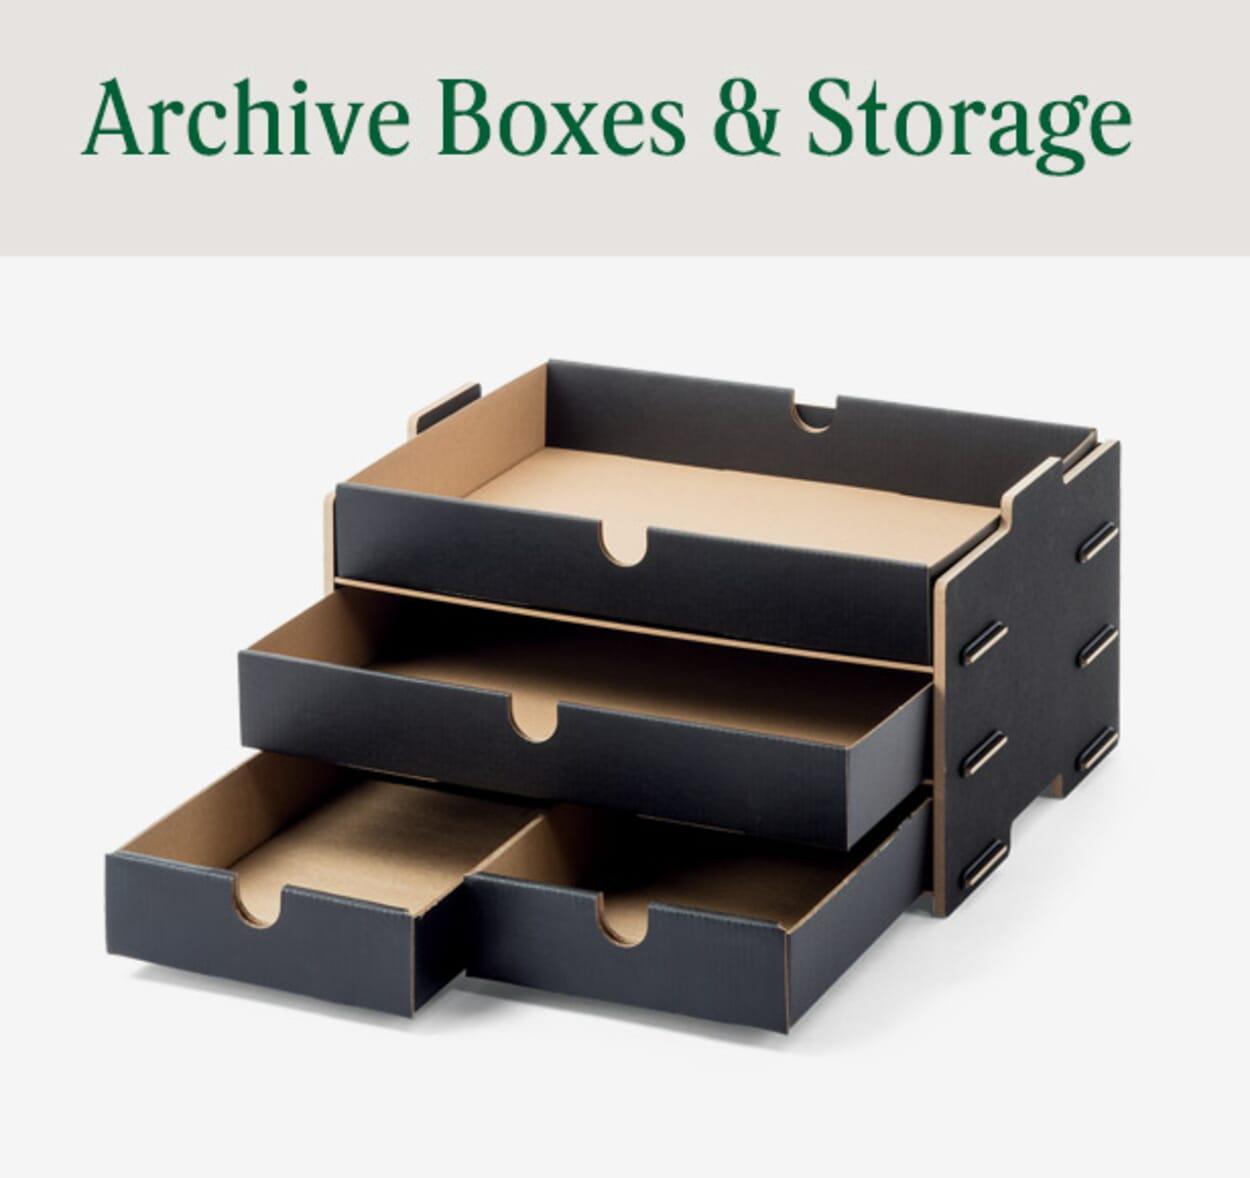 Archive Boxes & Storage